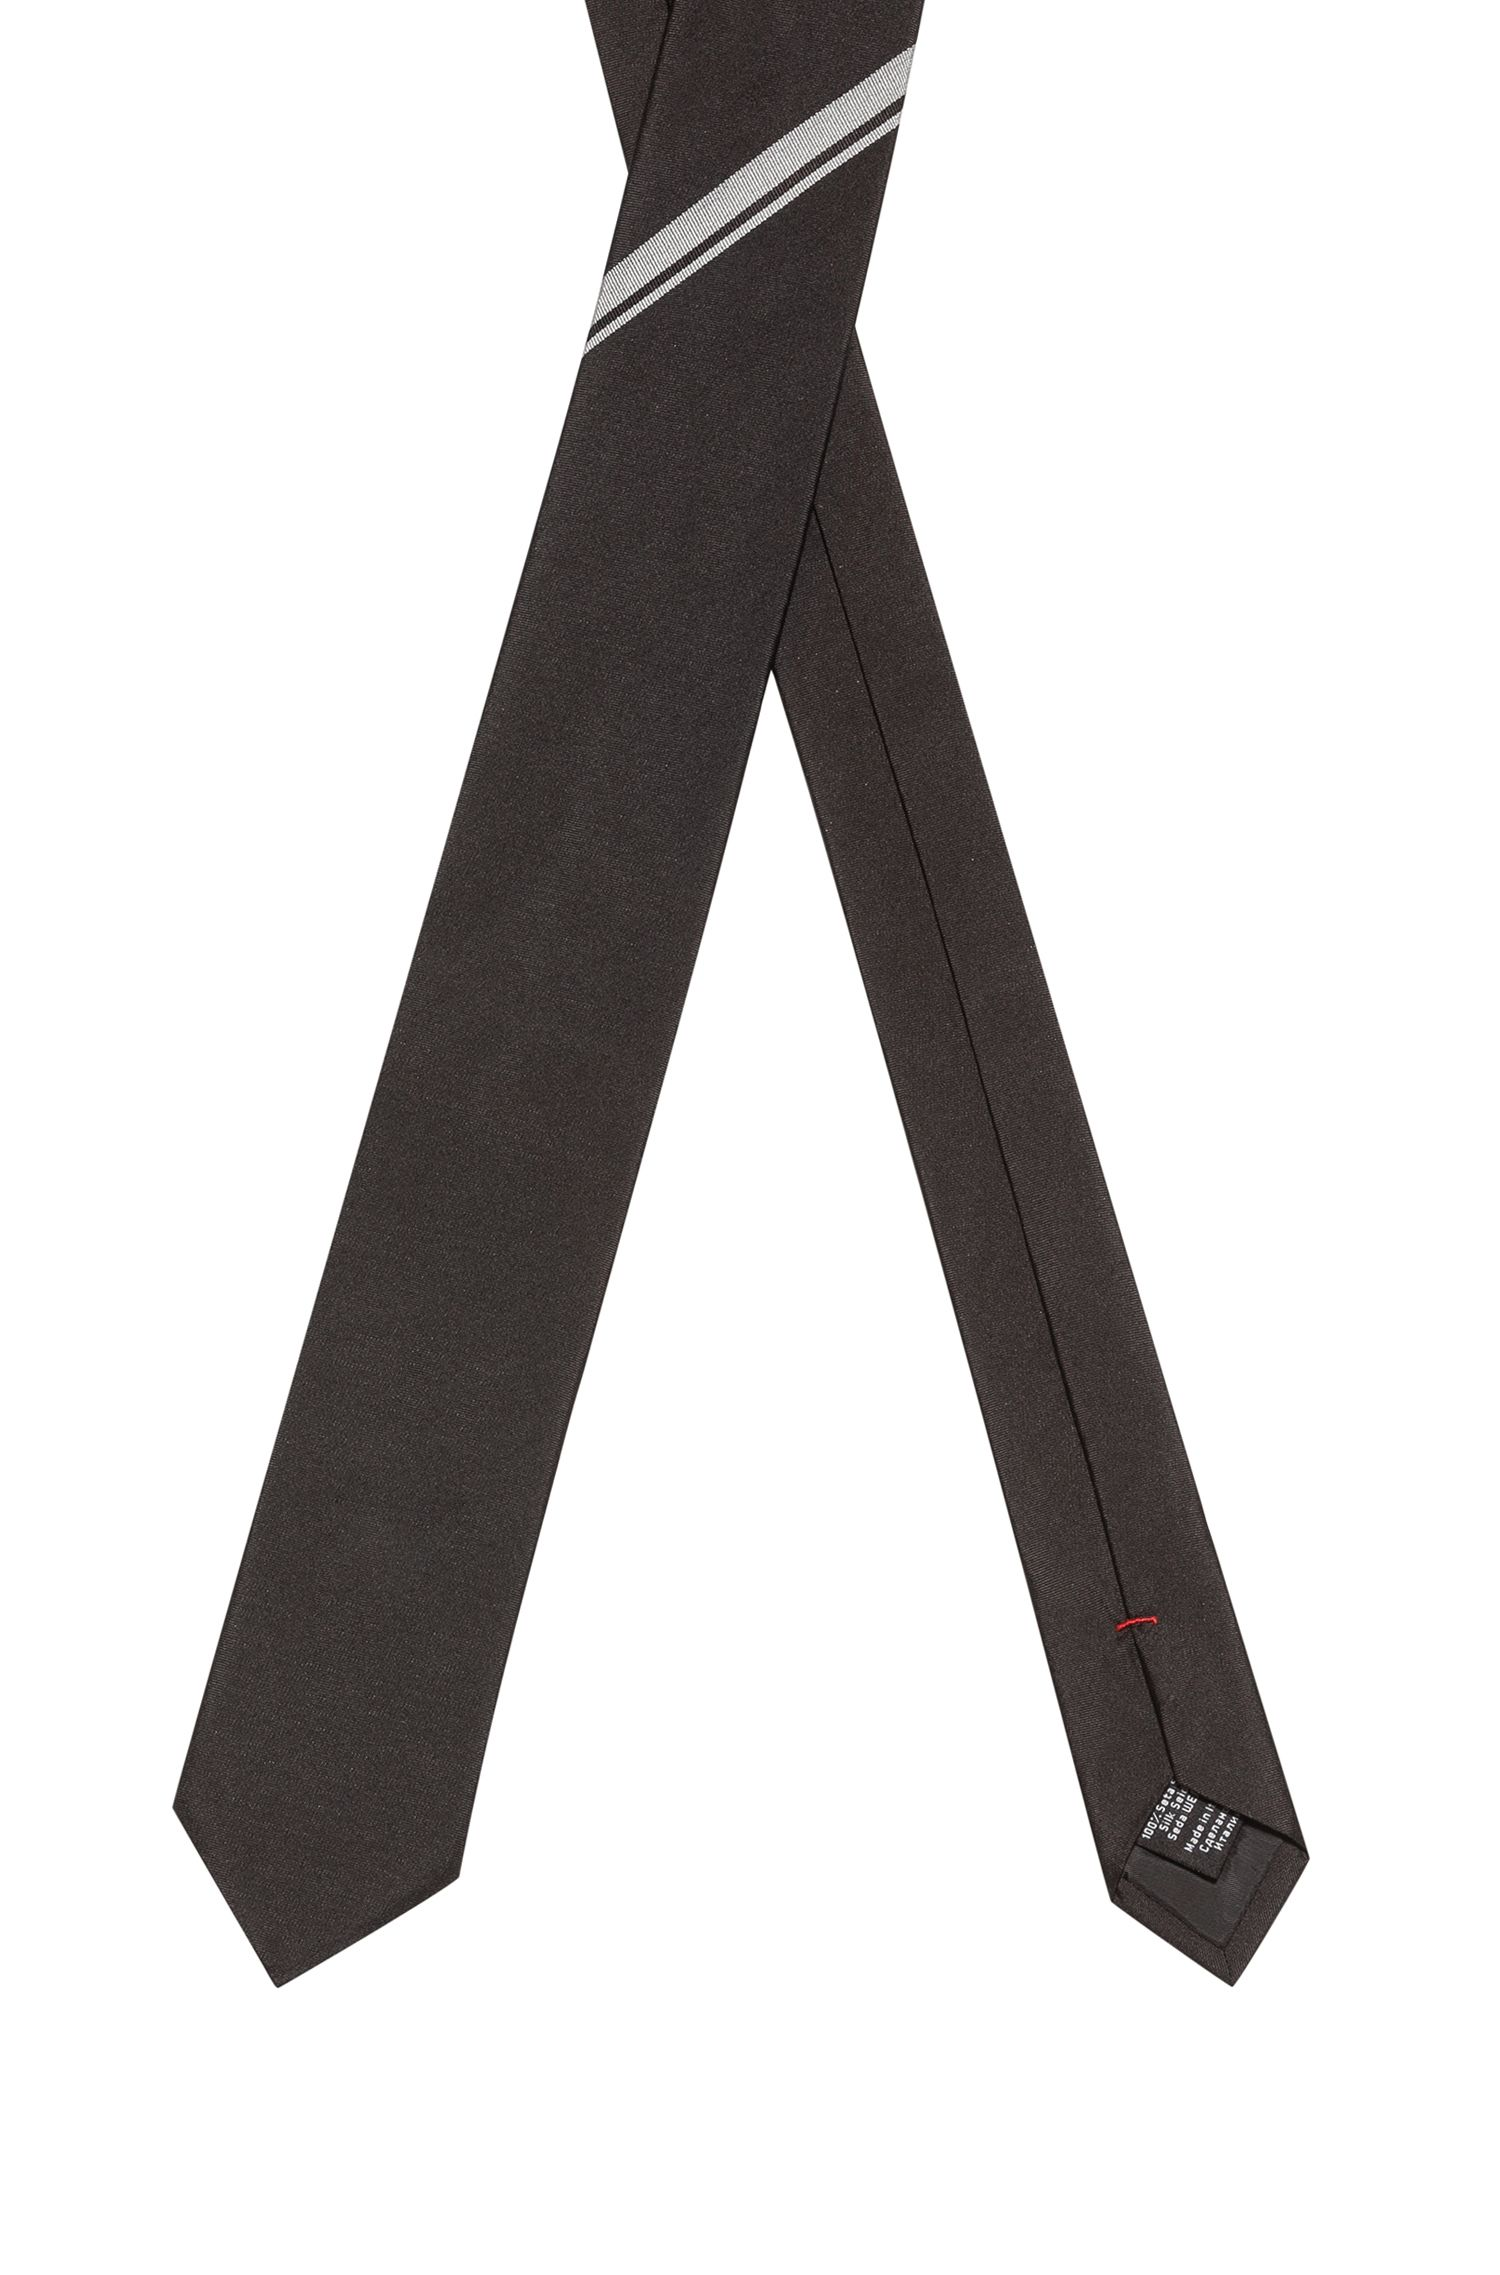 Silk-jacquard tie with stripe detail, Black